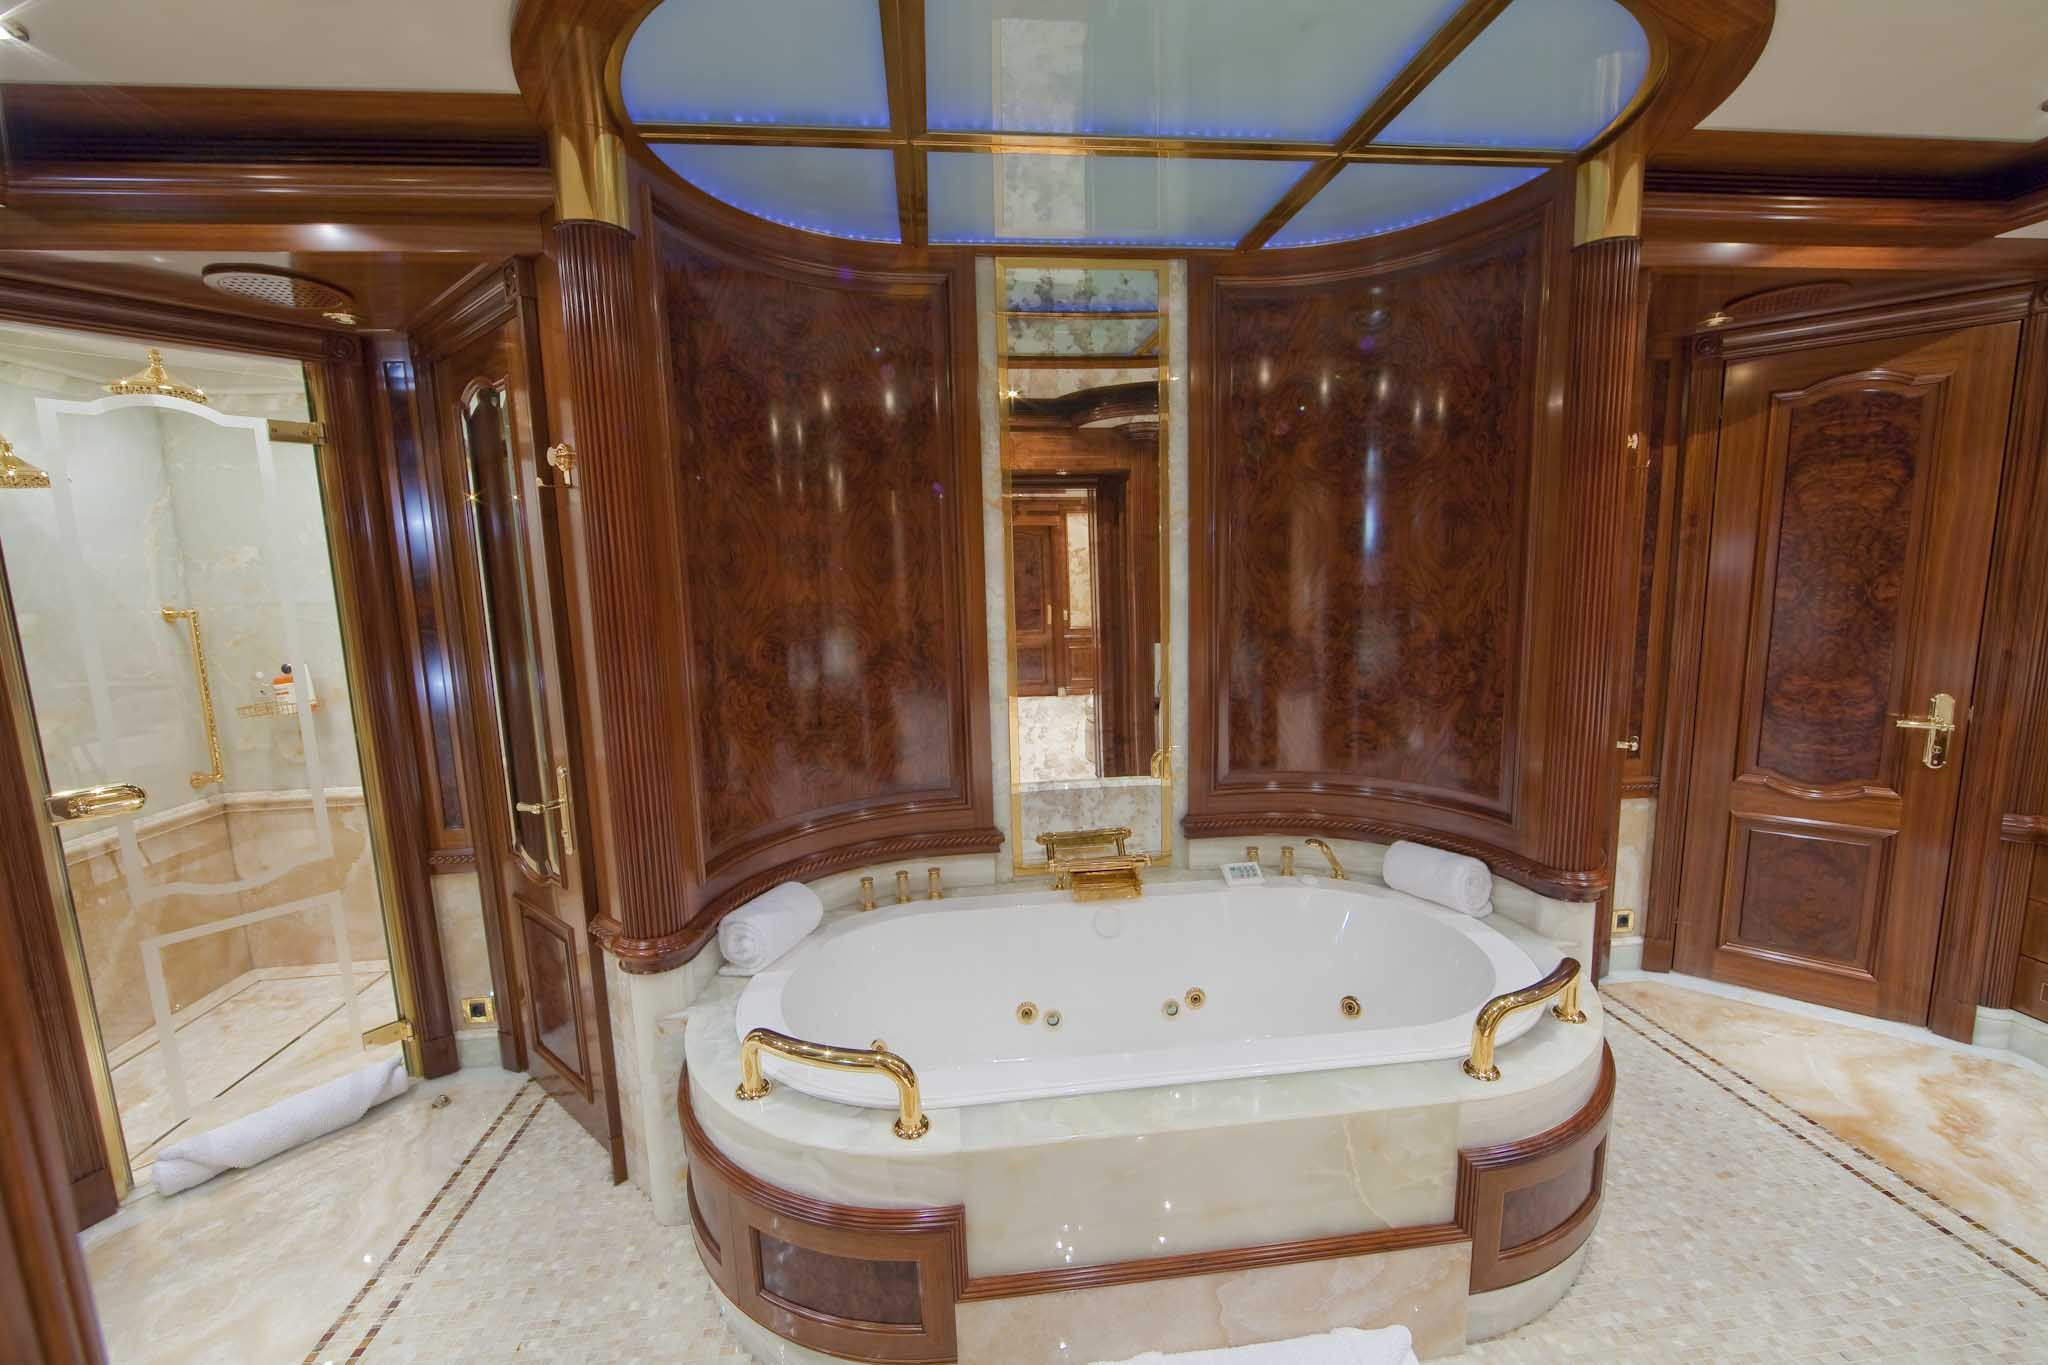 Luxury Bathrooms For The Rich Master Bathroom Makeover Bathroom